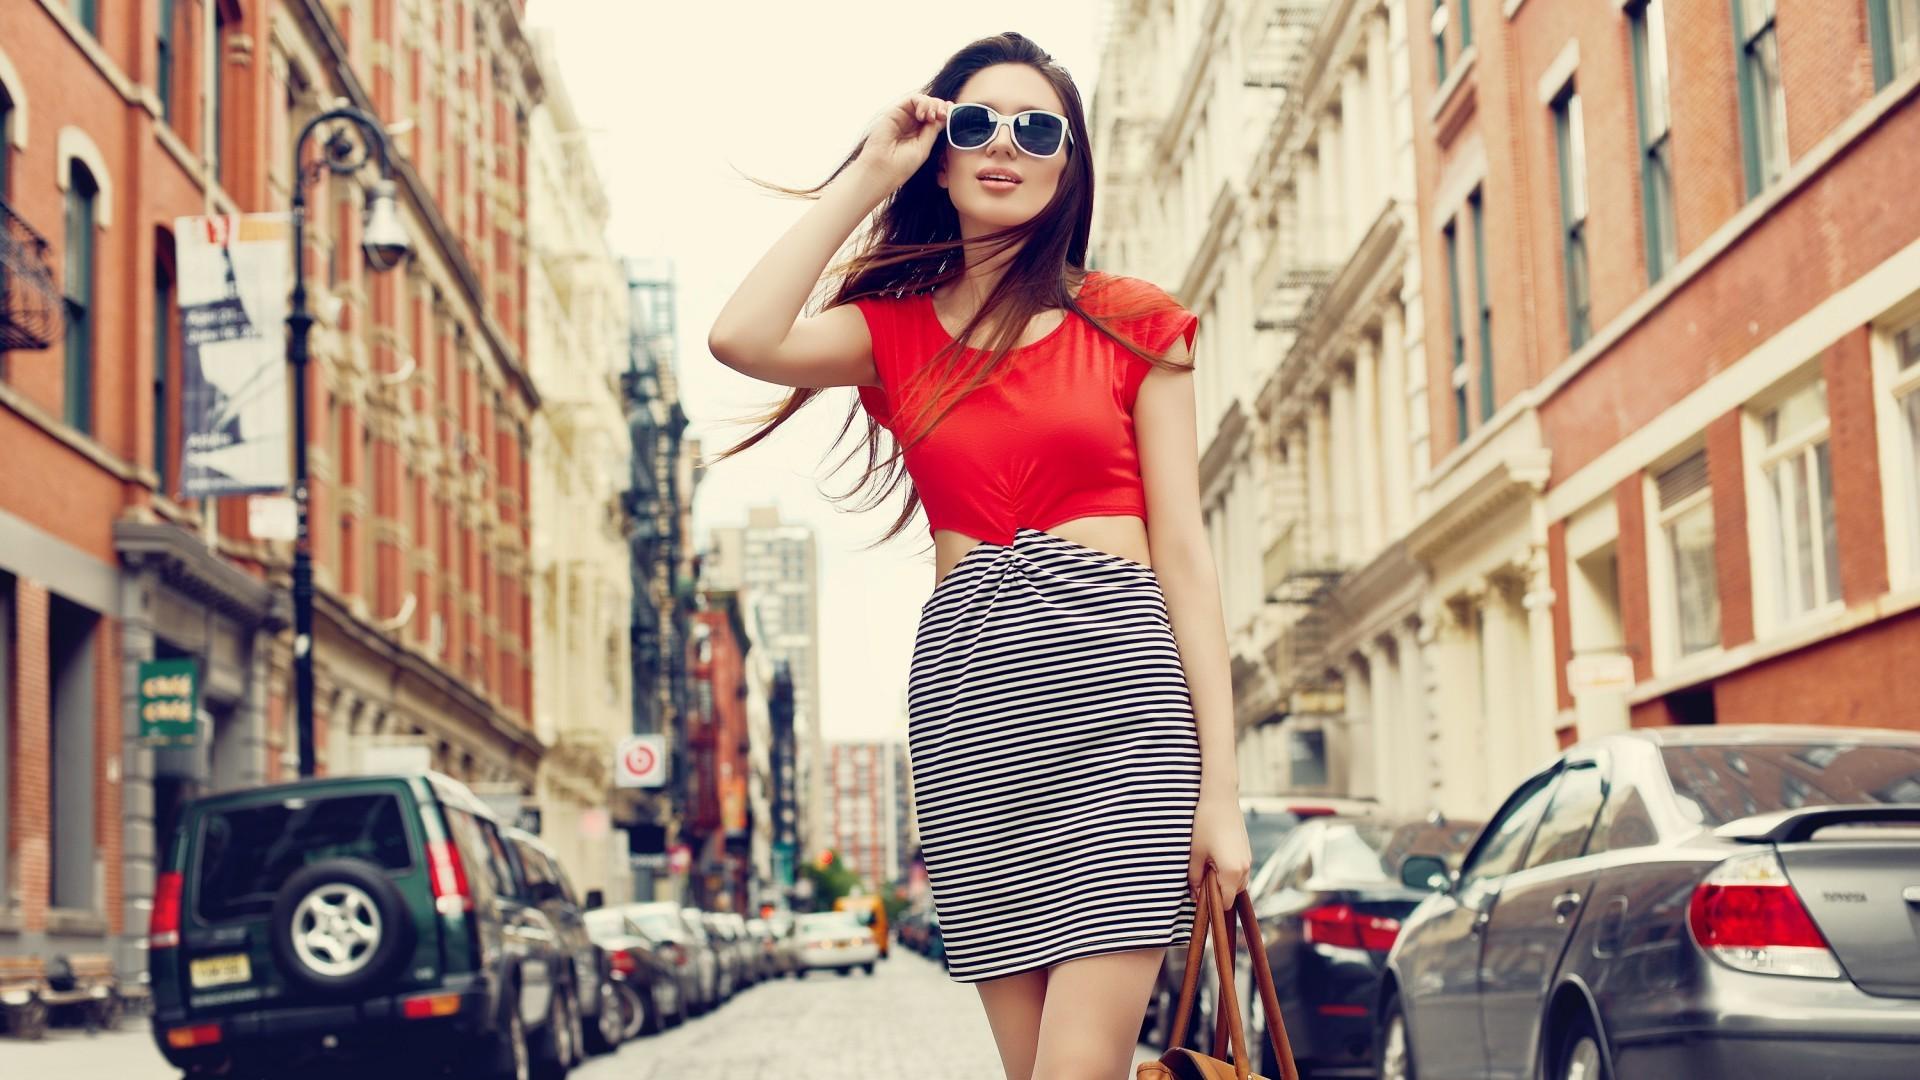 Beautiful Girl Walking Green Field Stock Photos, Images ...